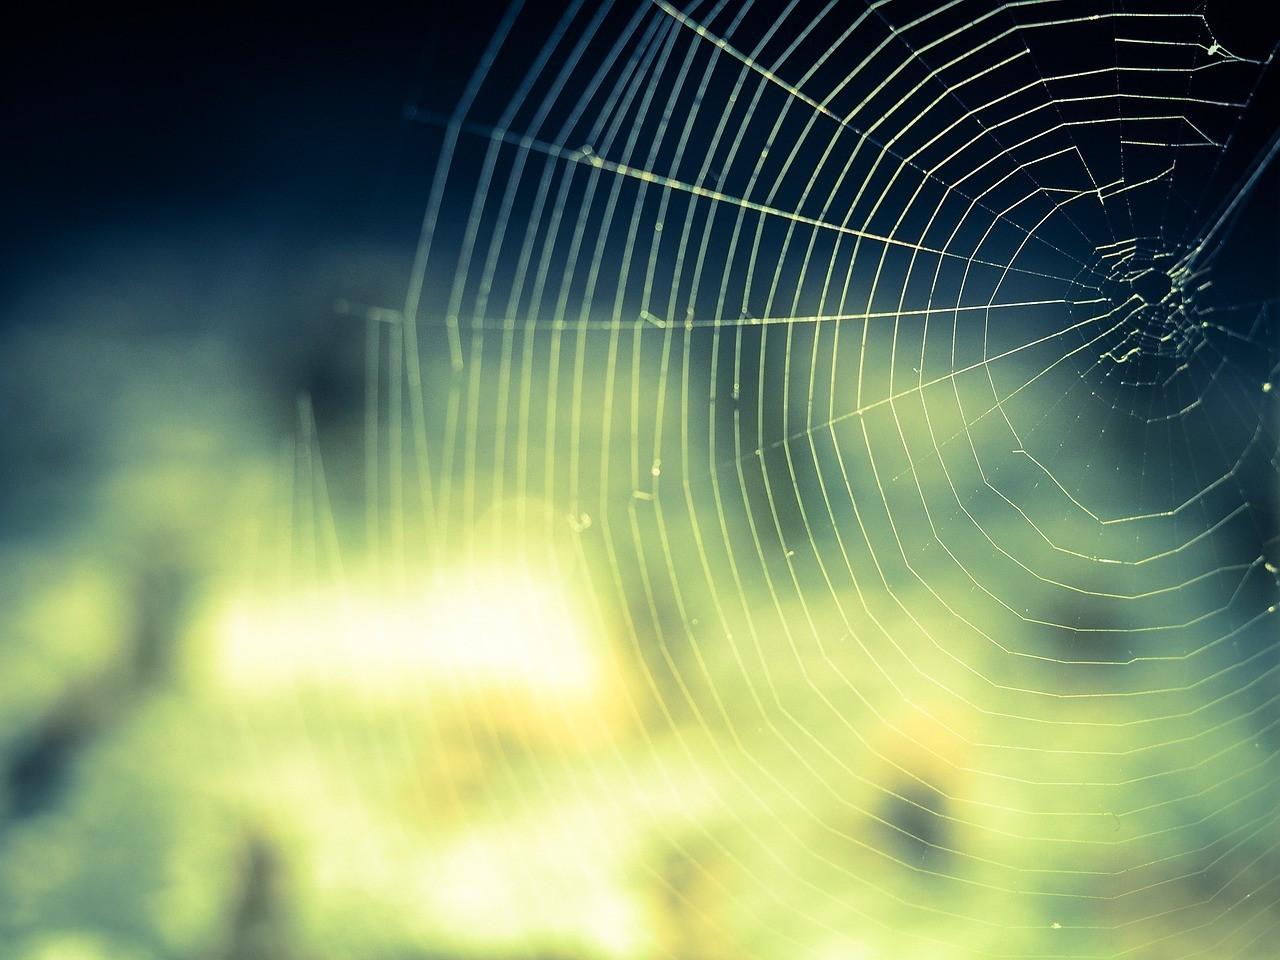 picadura arañas